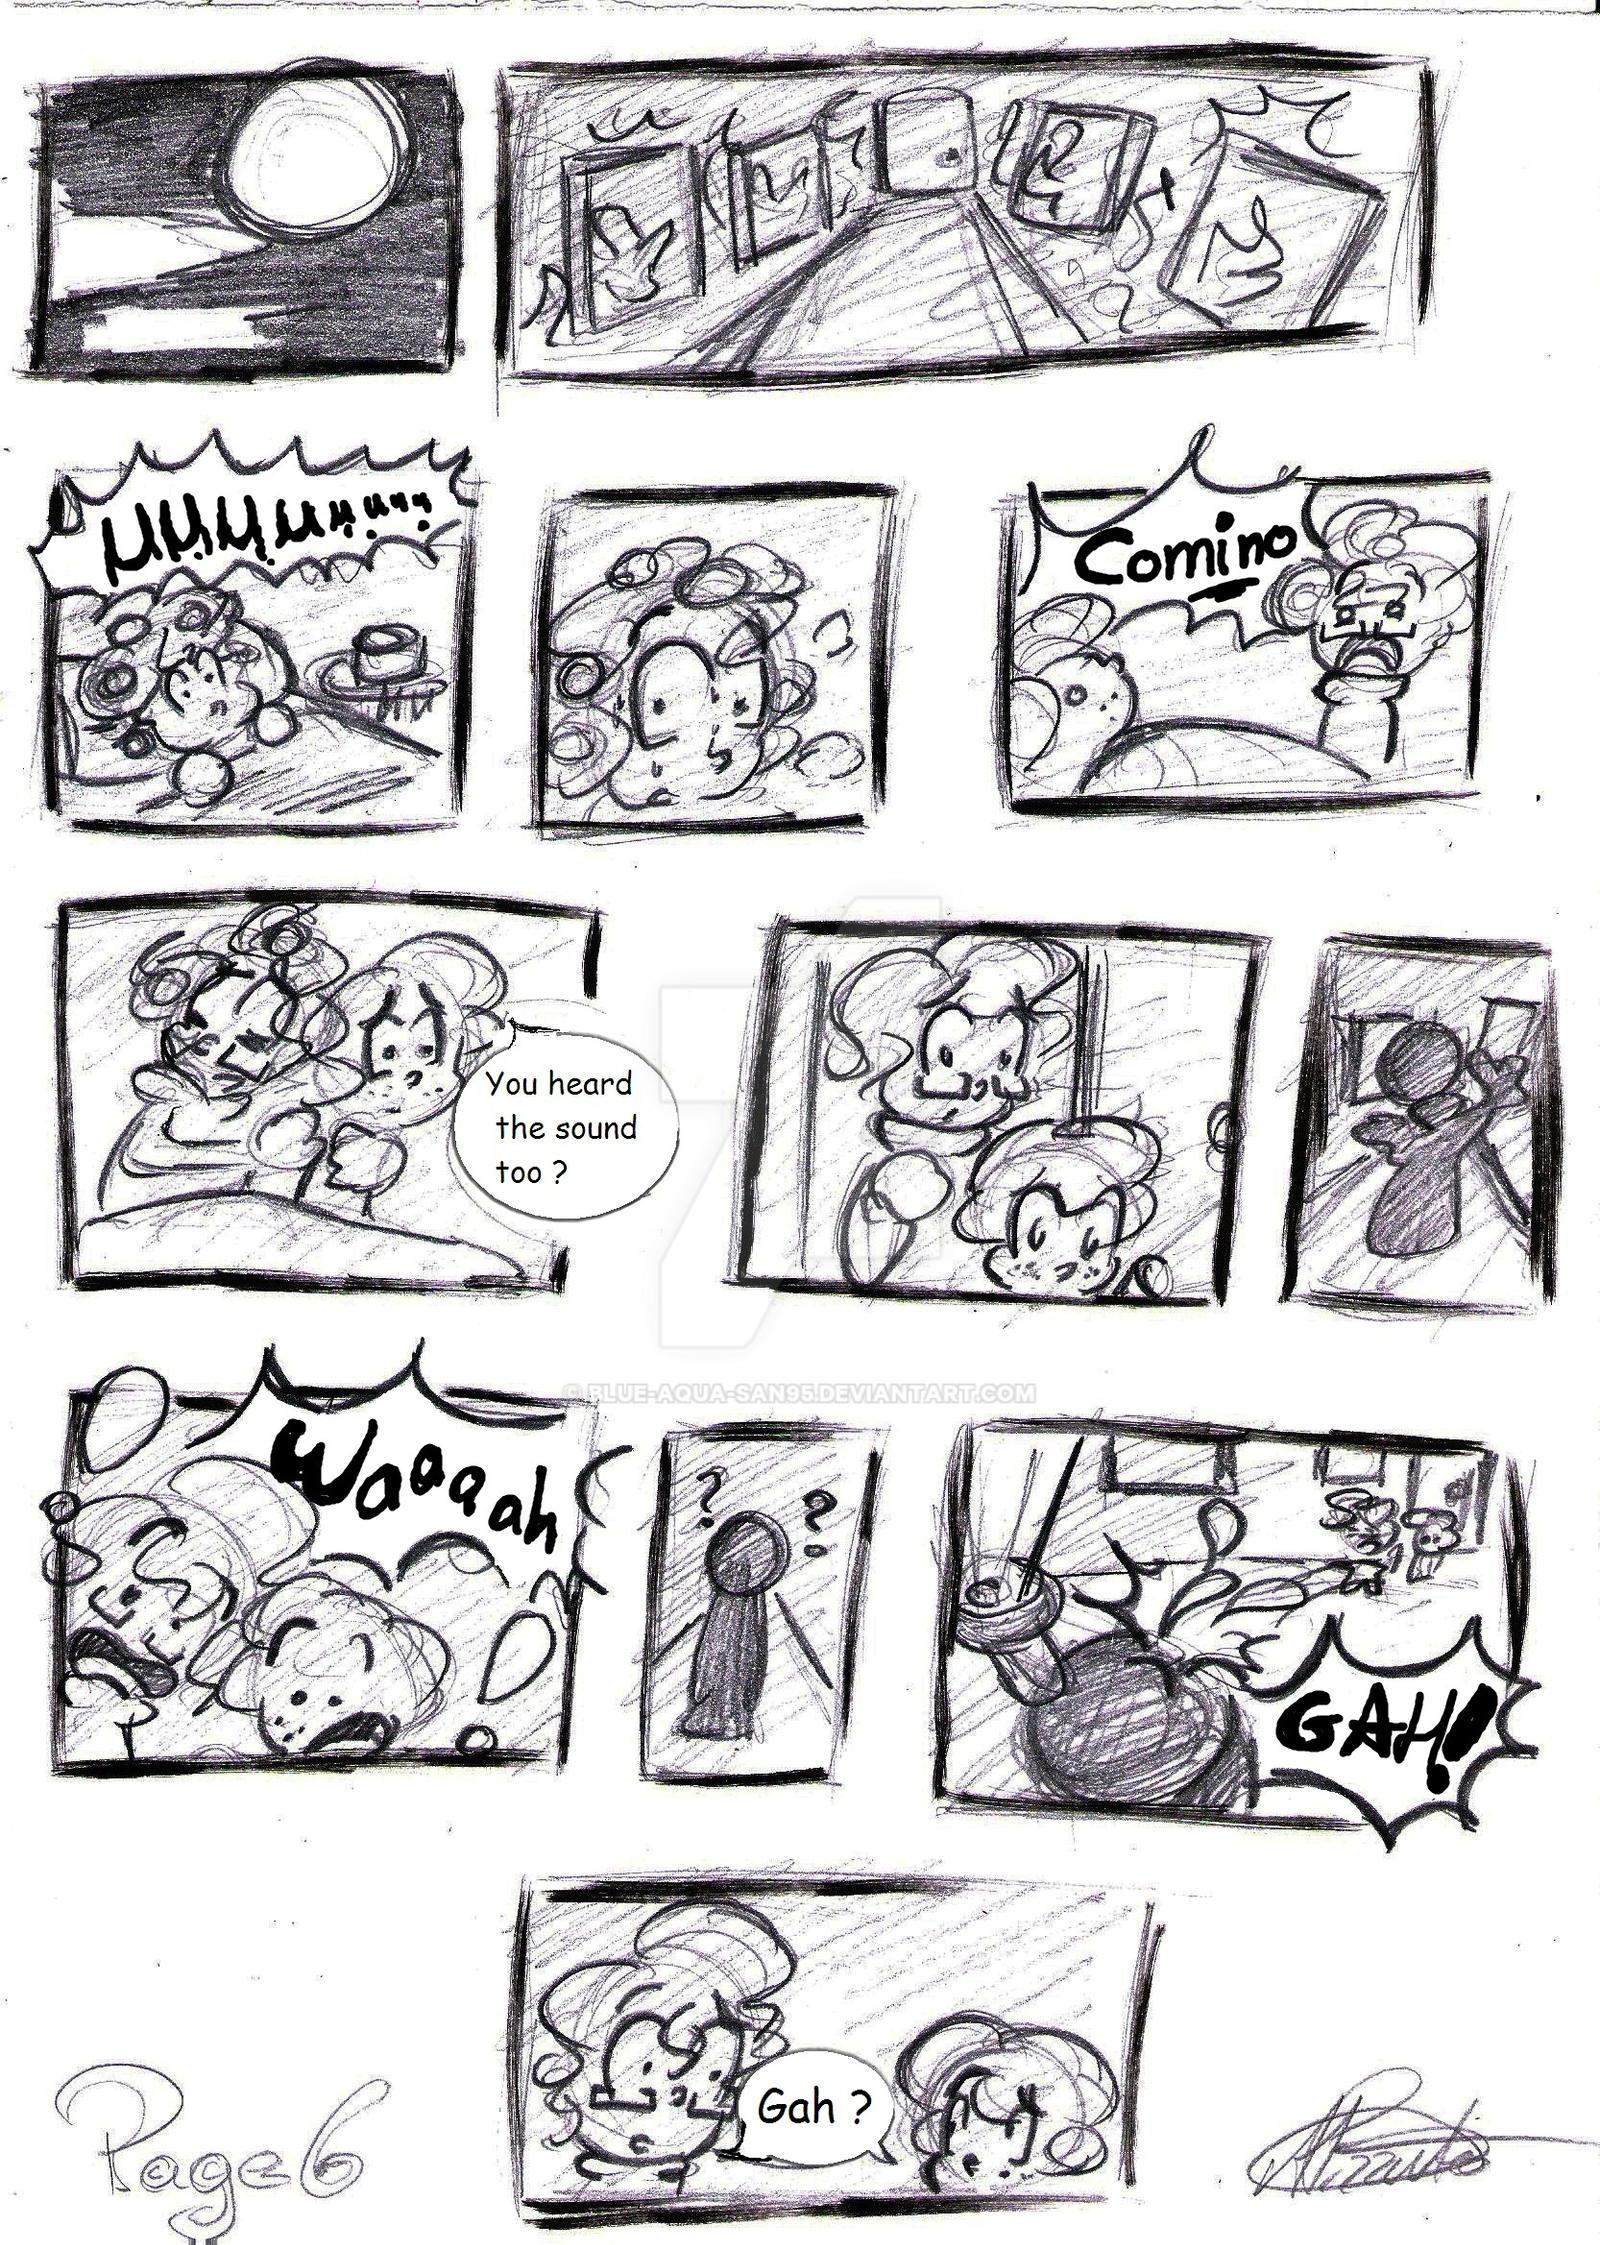 Freak Out - Page 6 by Blue-Aqua-san95